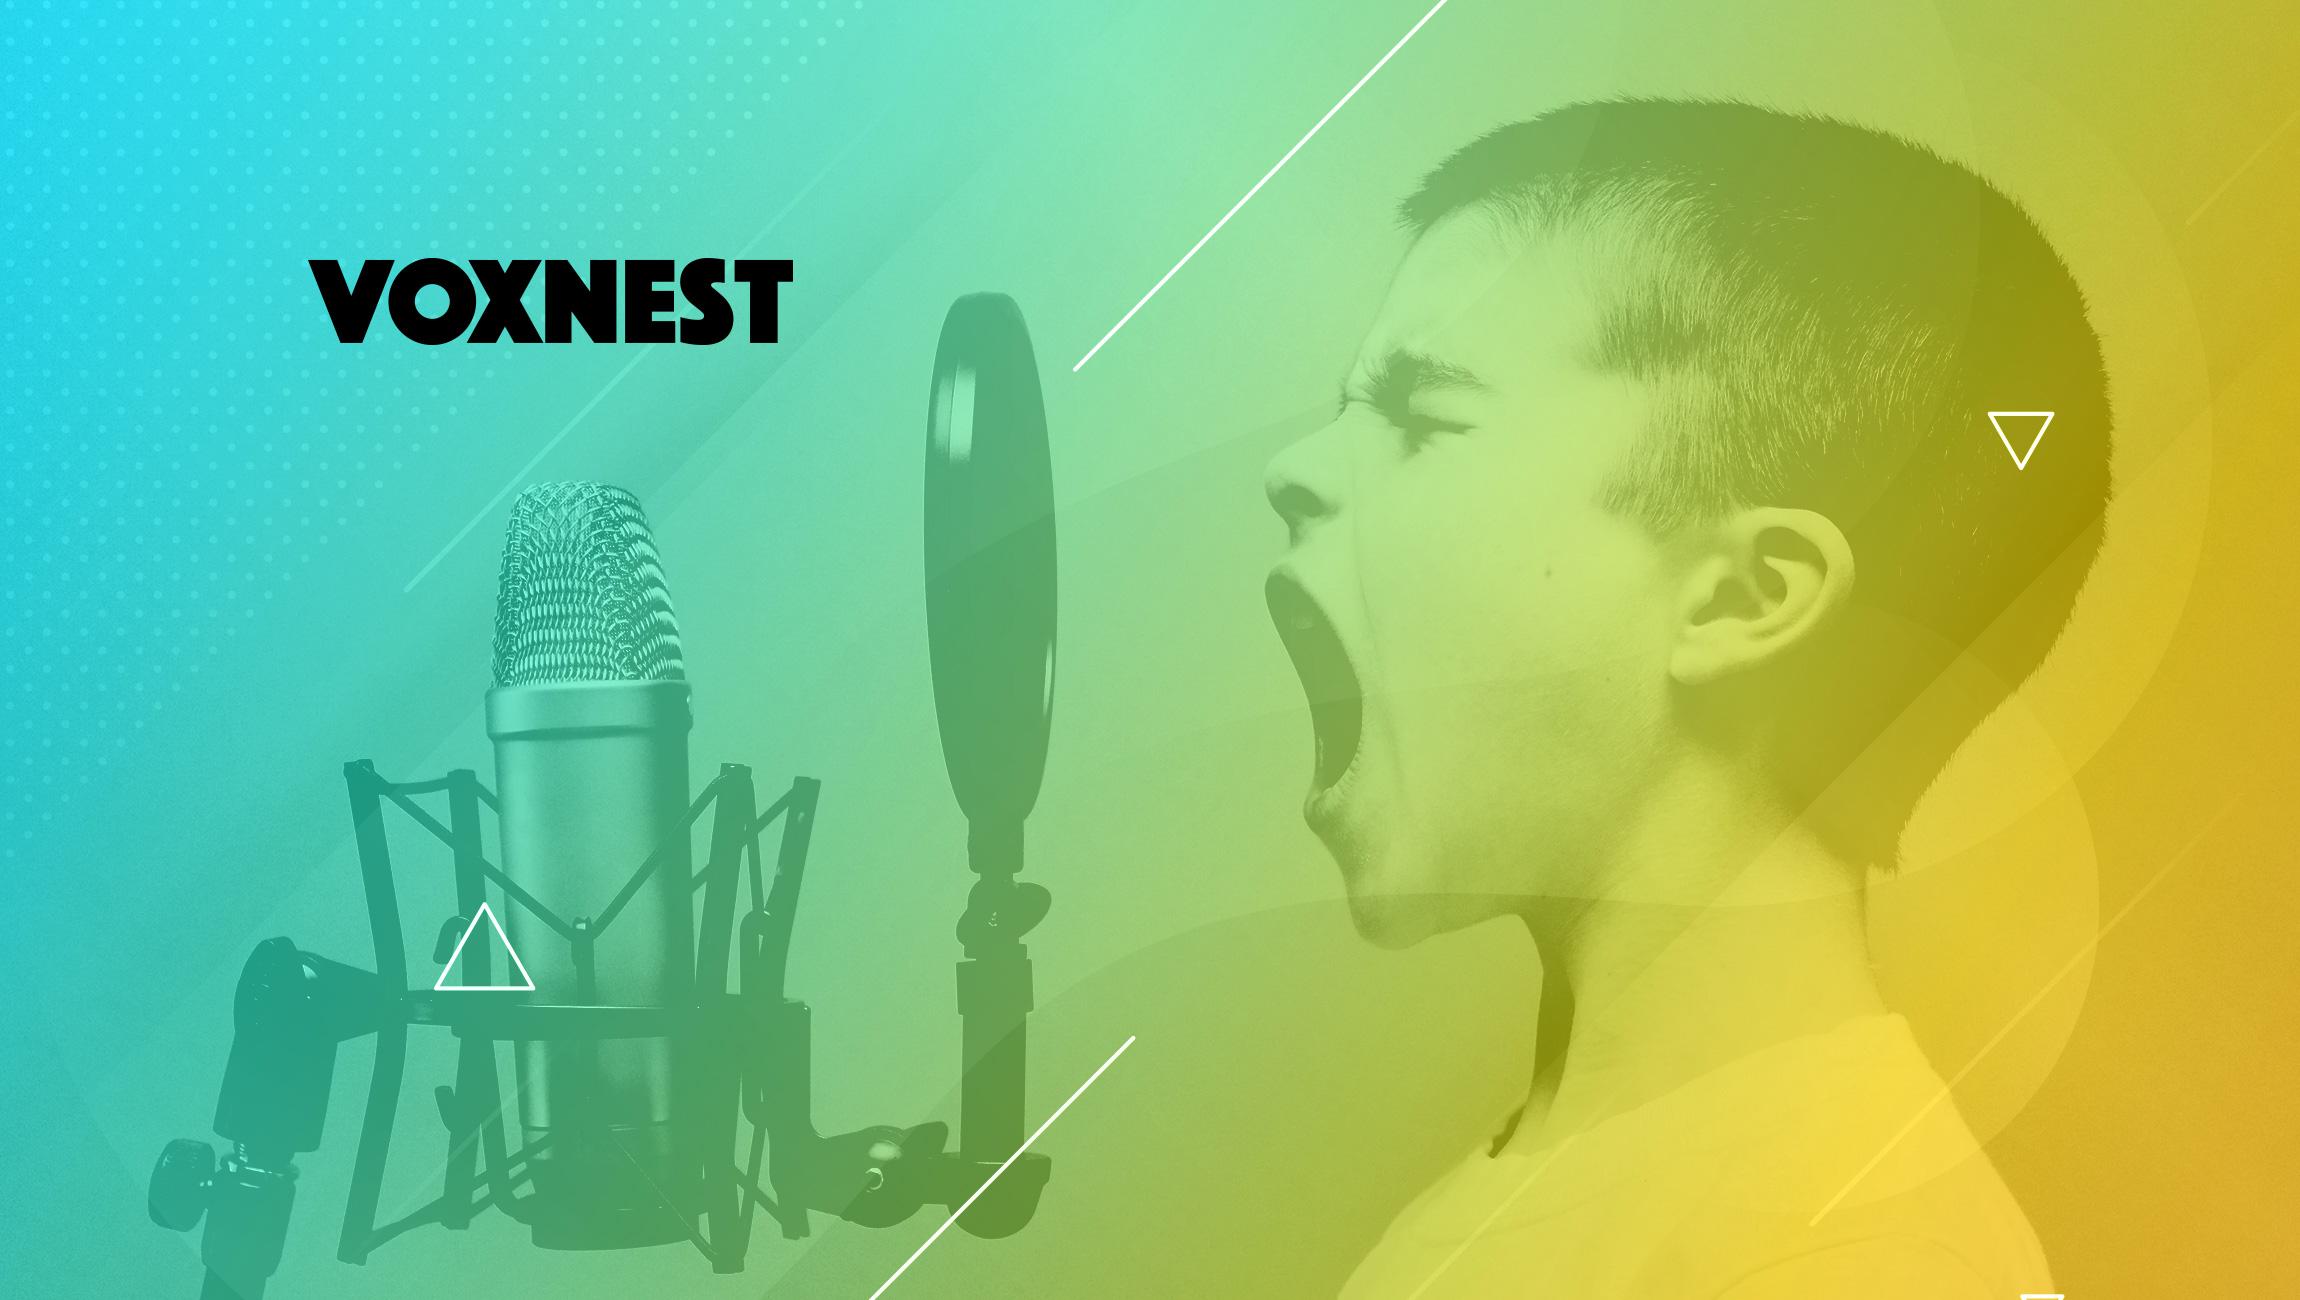 IAB Podcast Measurement Compliance Certifies Voxnest Audience Network